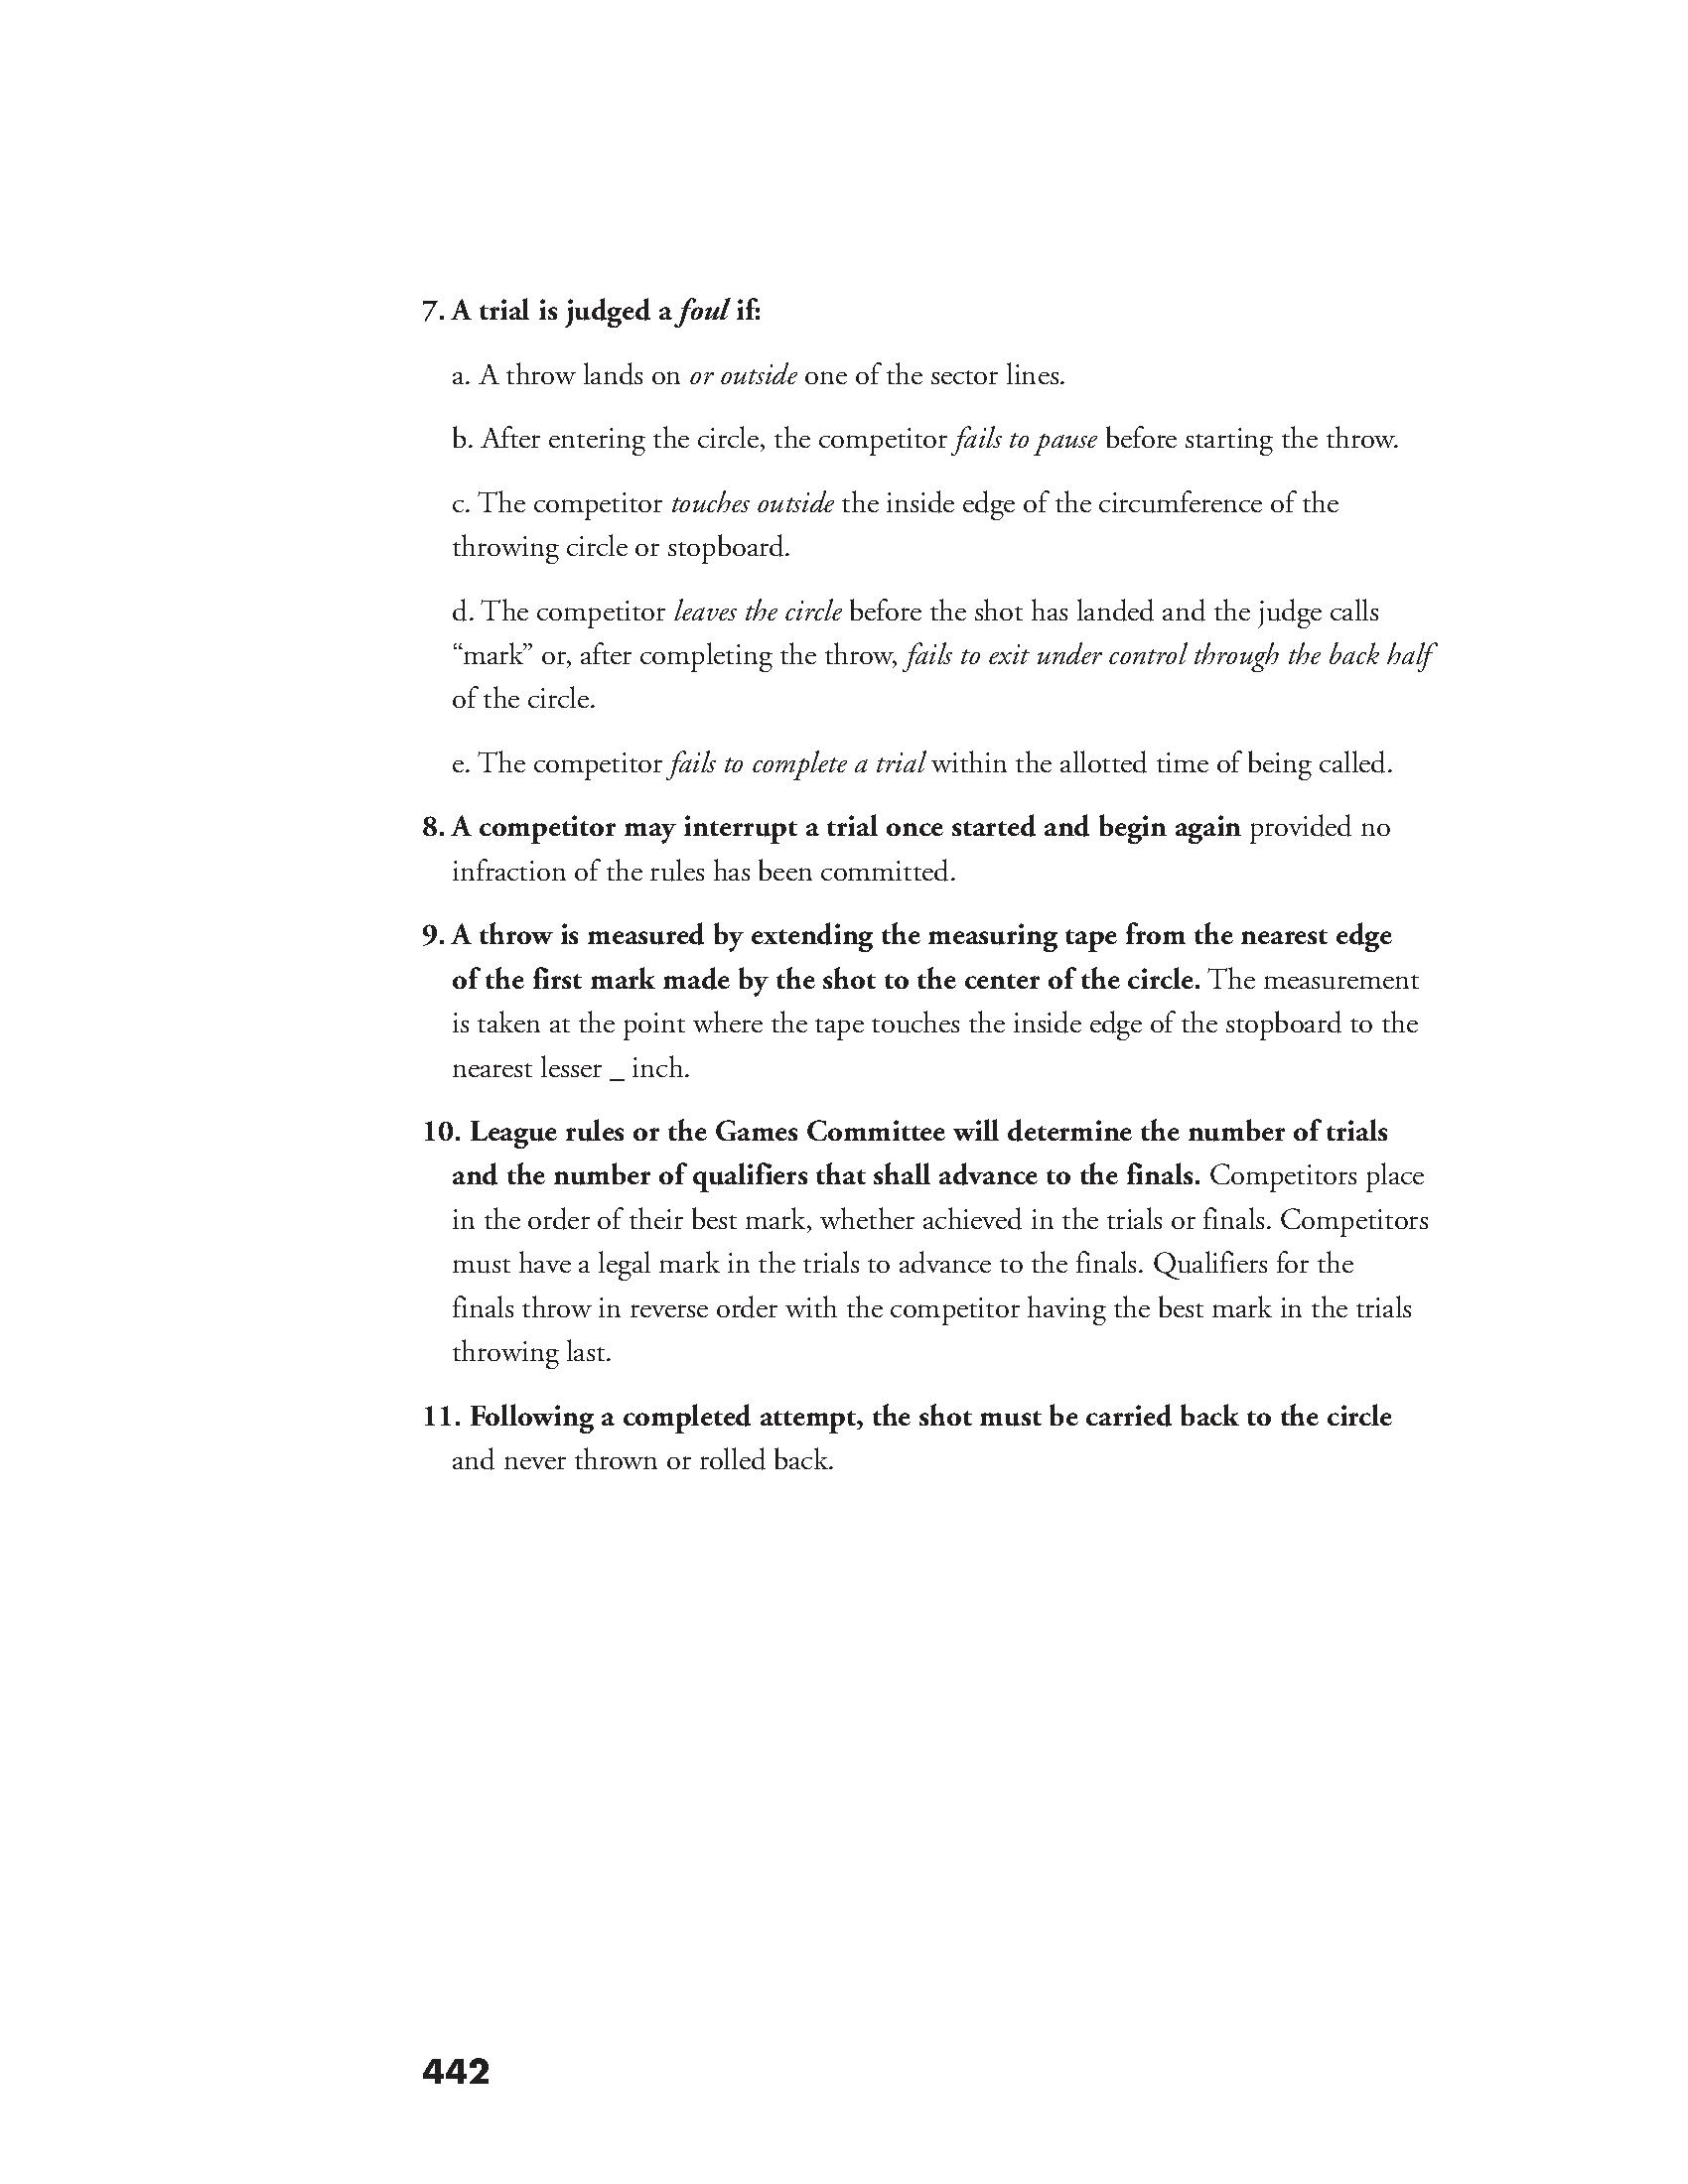 LA84trackfield 442 - LA84 Coaching Manuals Collection - LA84